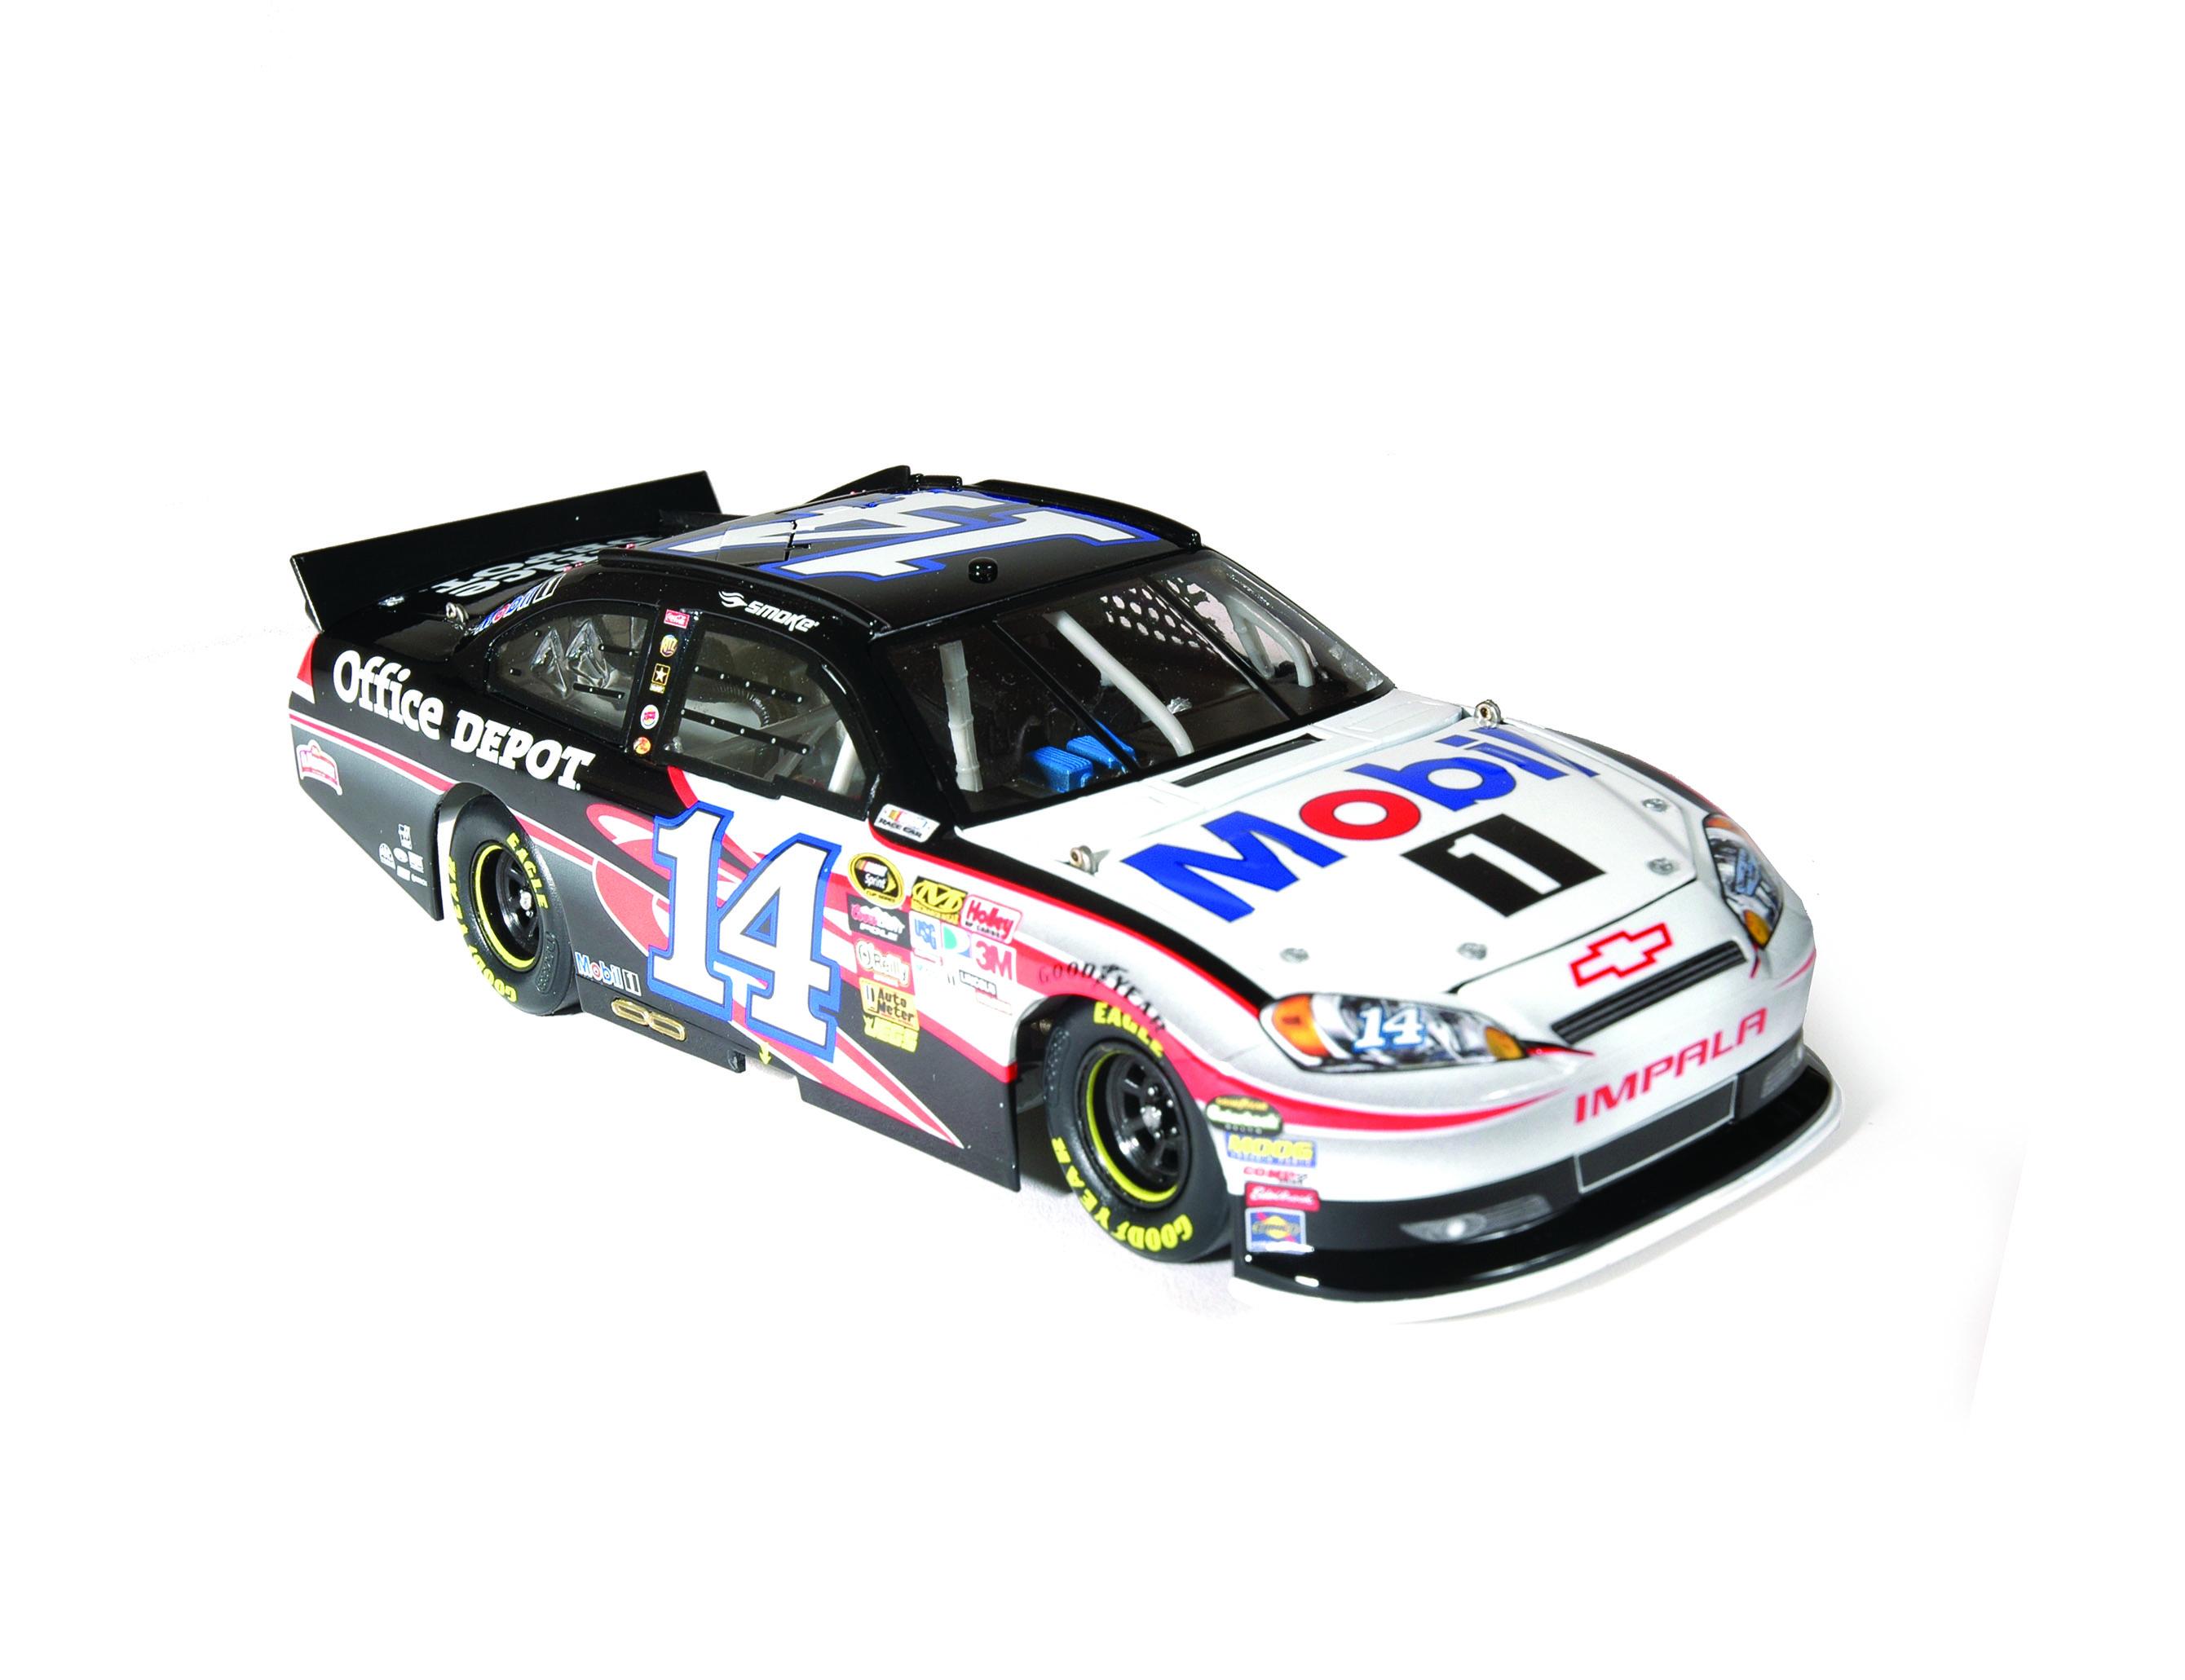 LIONEL NASCAR #14 Impala